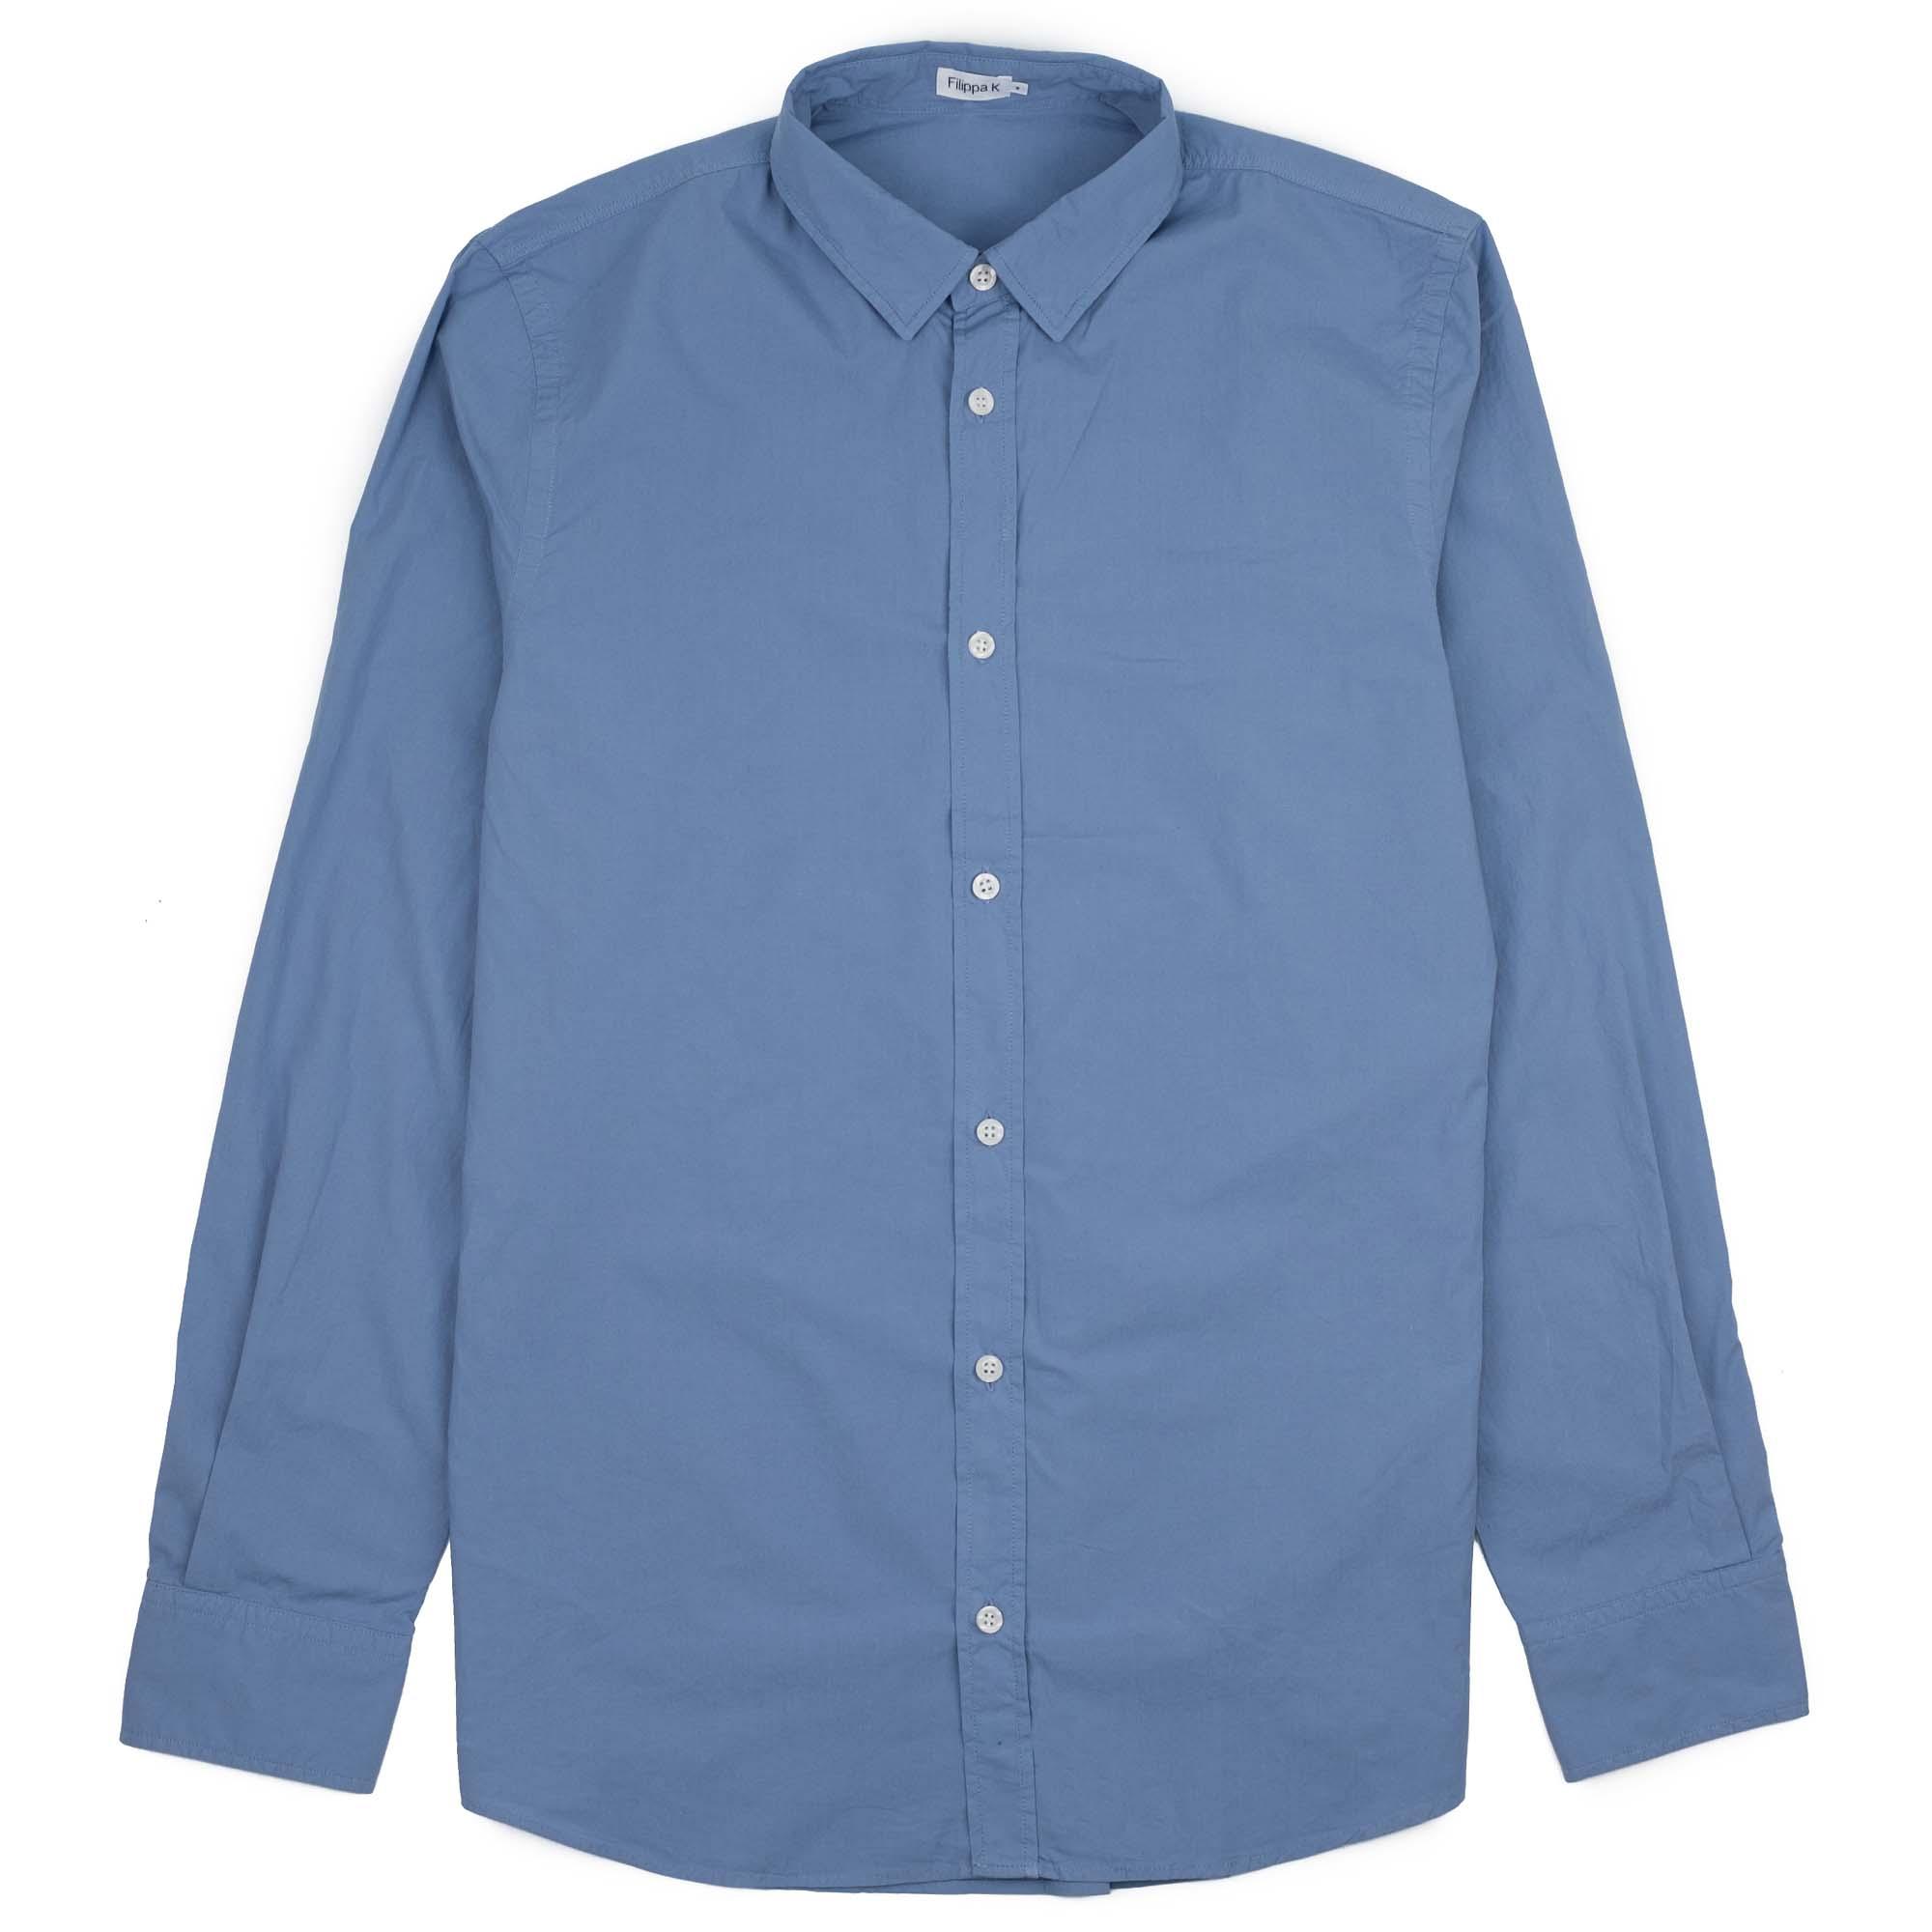 Ben Washed Poplin Shirt Paris Blue 1